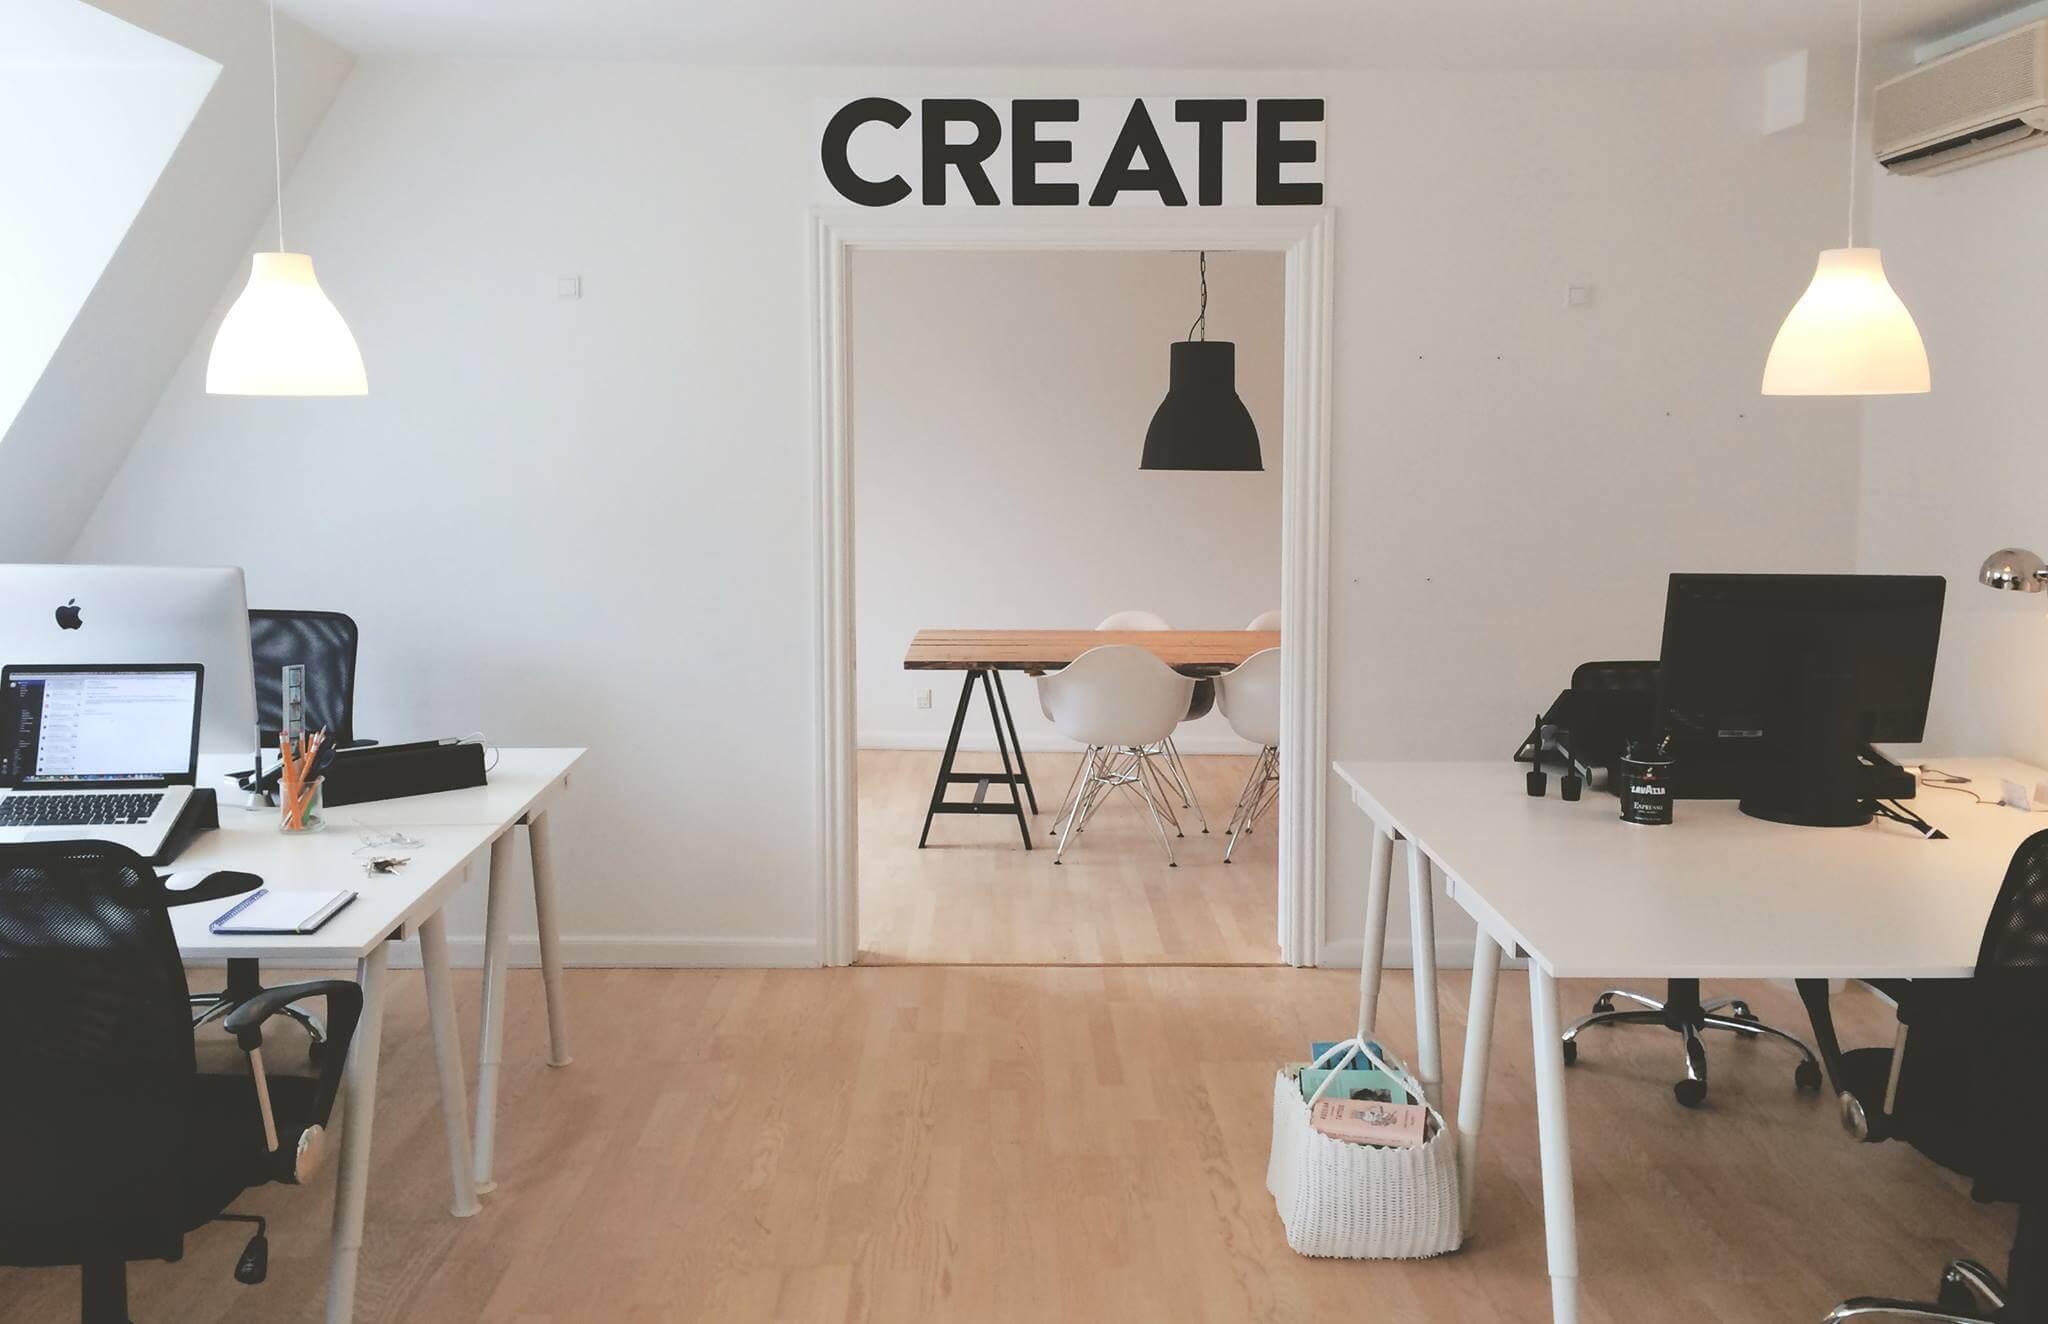 Kan startupmentaliteten sprede sig til reklamebranchen?